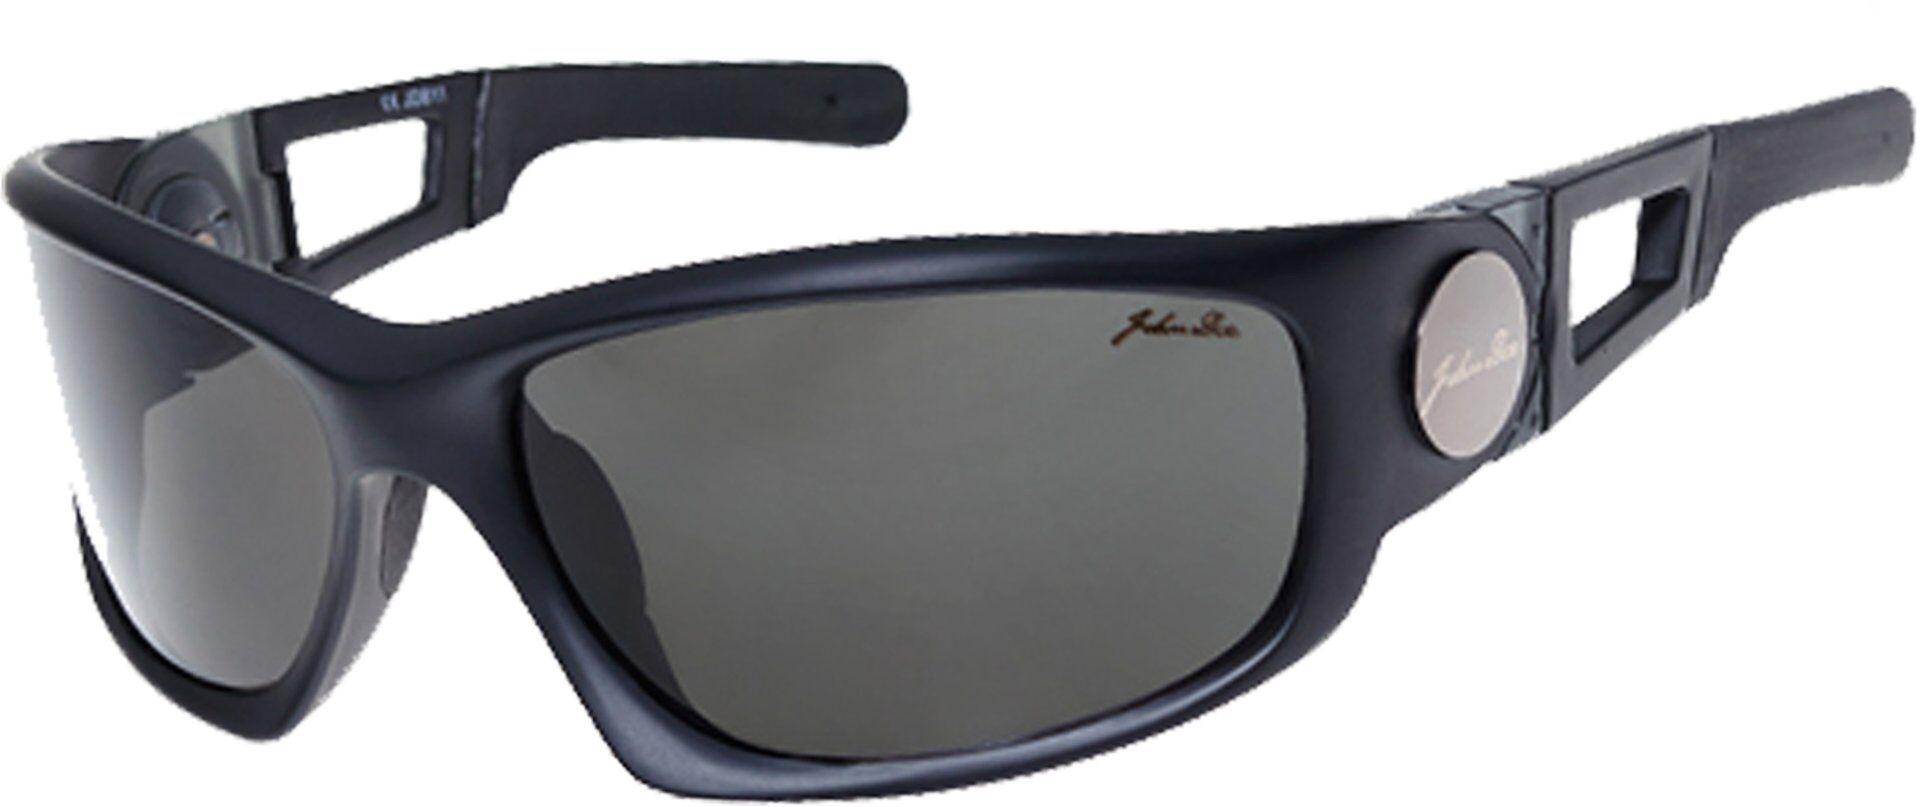 John Doe Airflow Photocromatic Sunglasses Black One Size